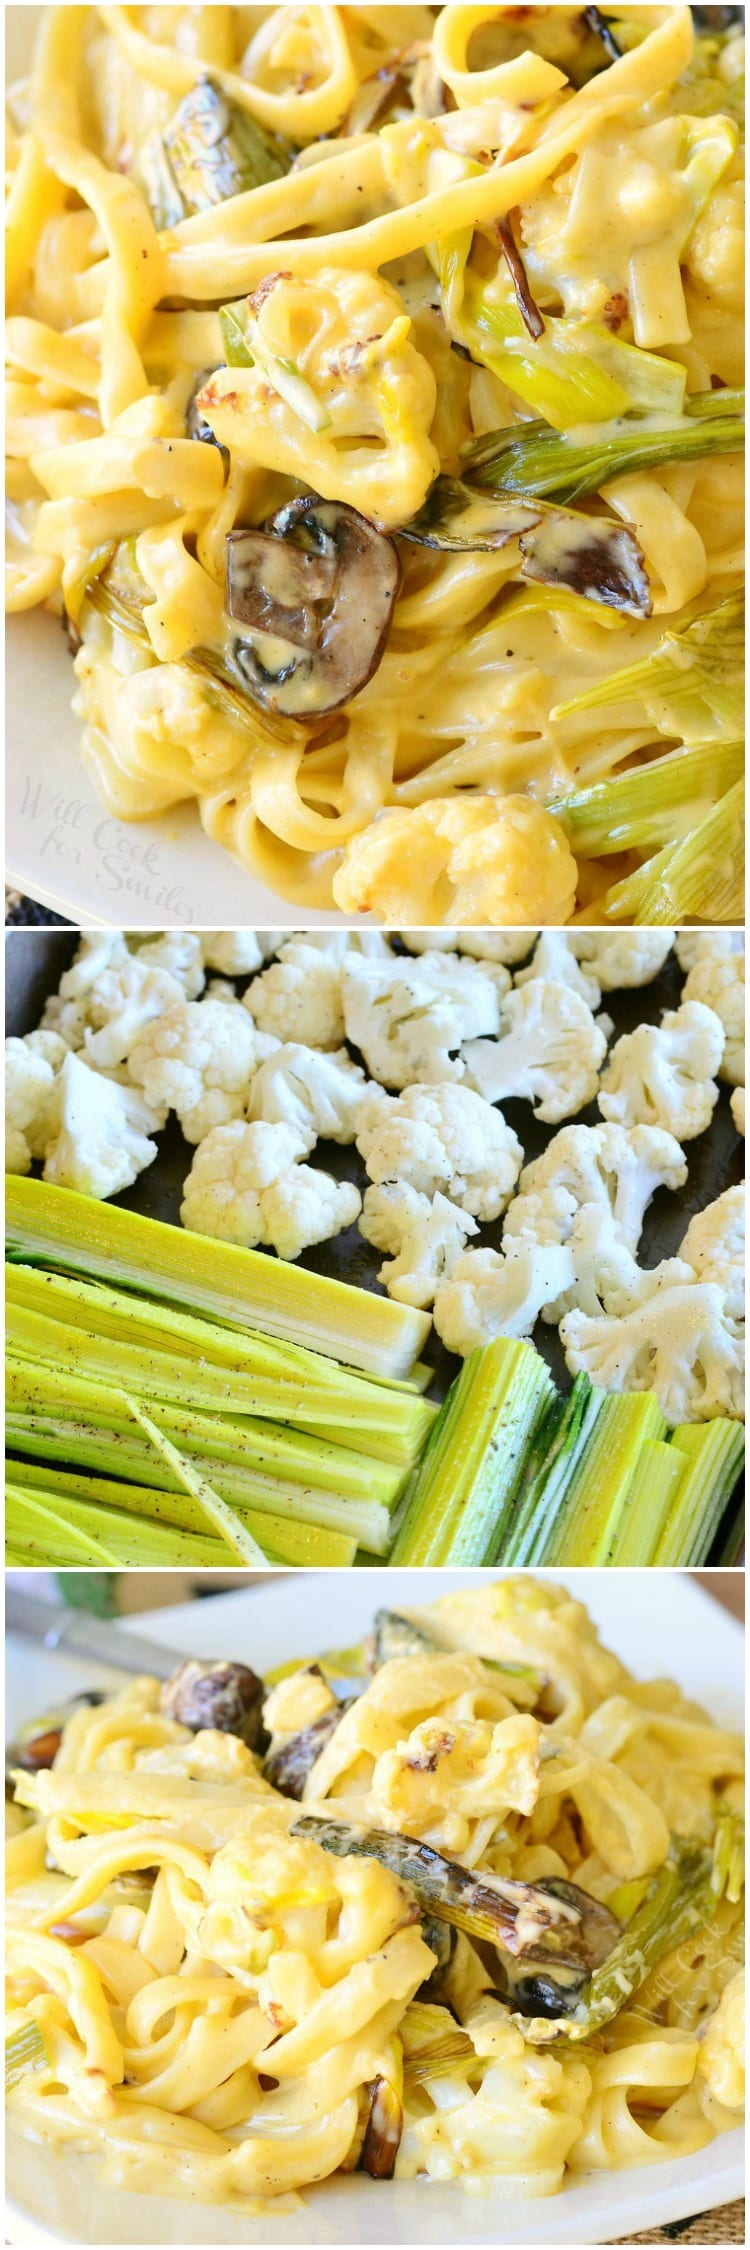 Roasted Cauliflower Leek and Mushroom Fettuccine in Garlic Cheese Sauce | from willcookforsmiles.com #pasta #comfortfood #veggies